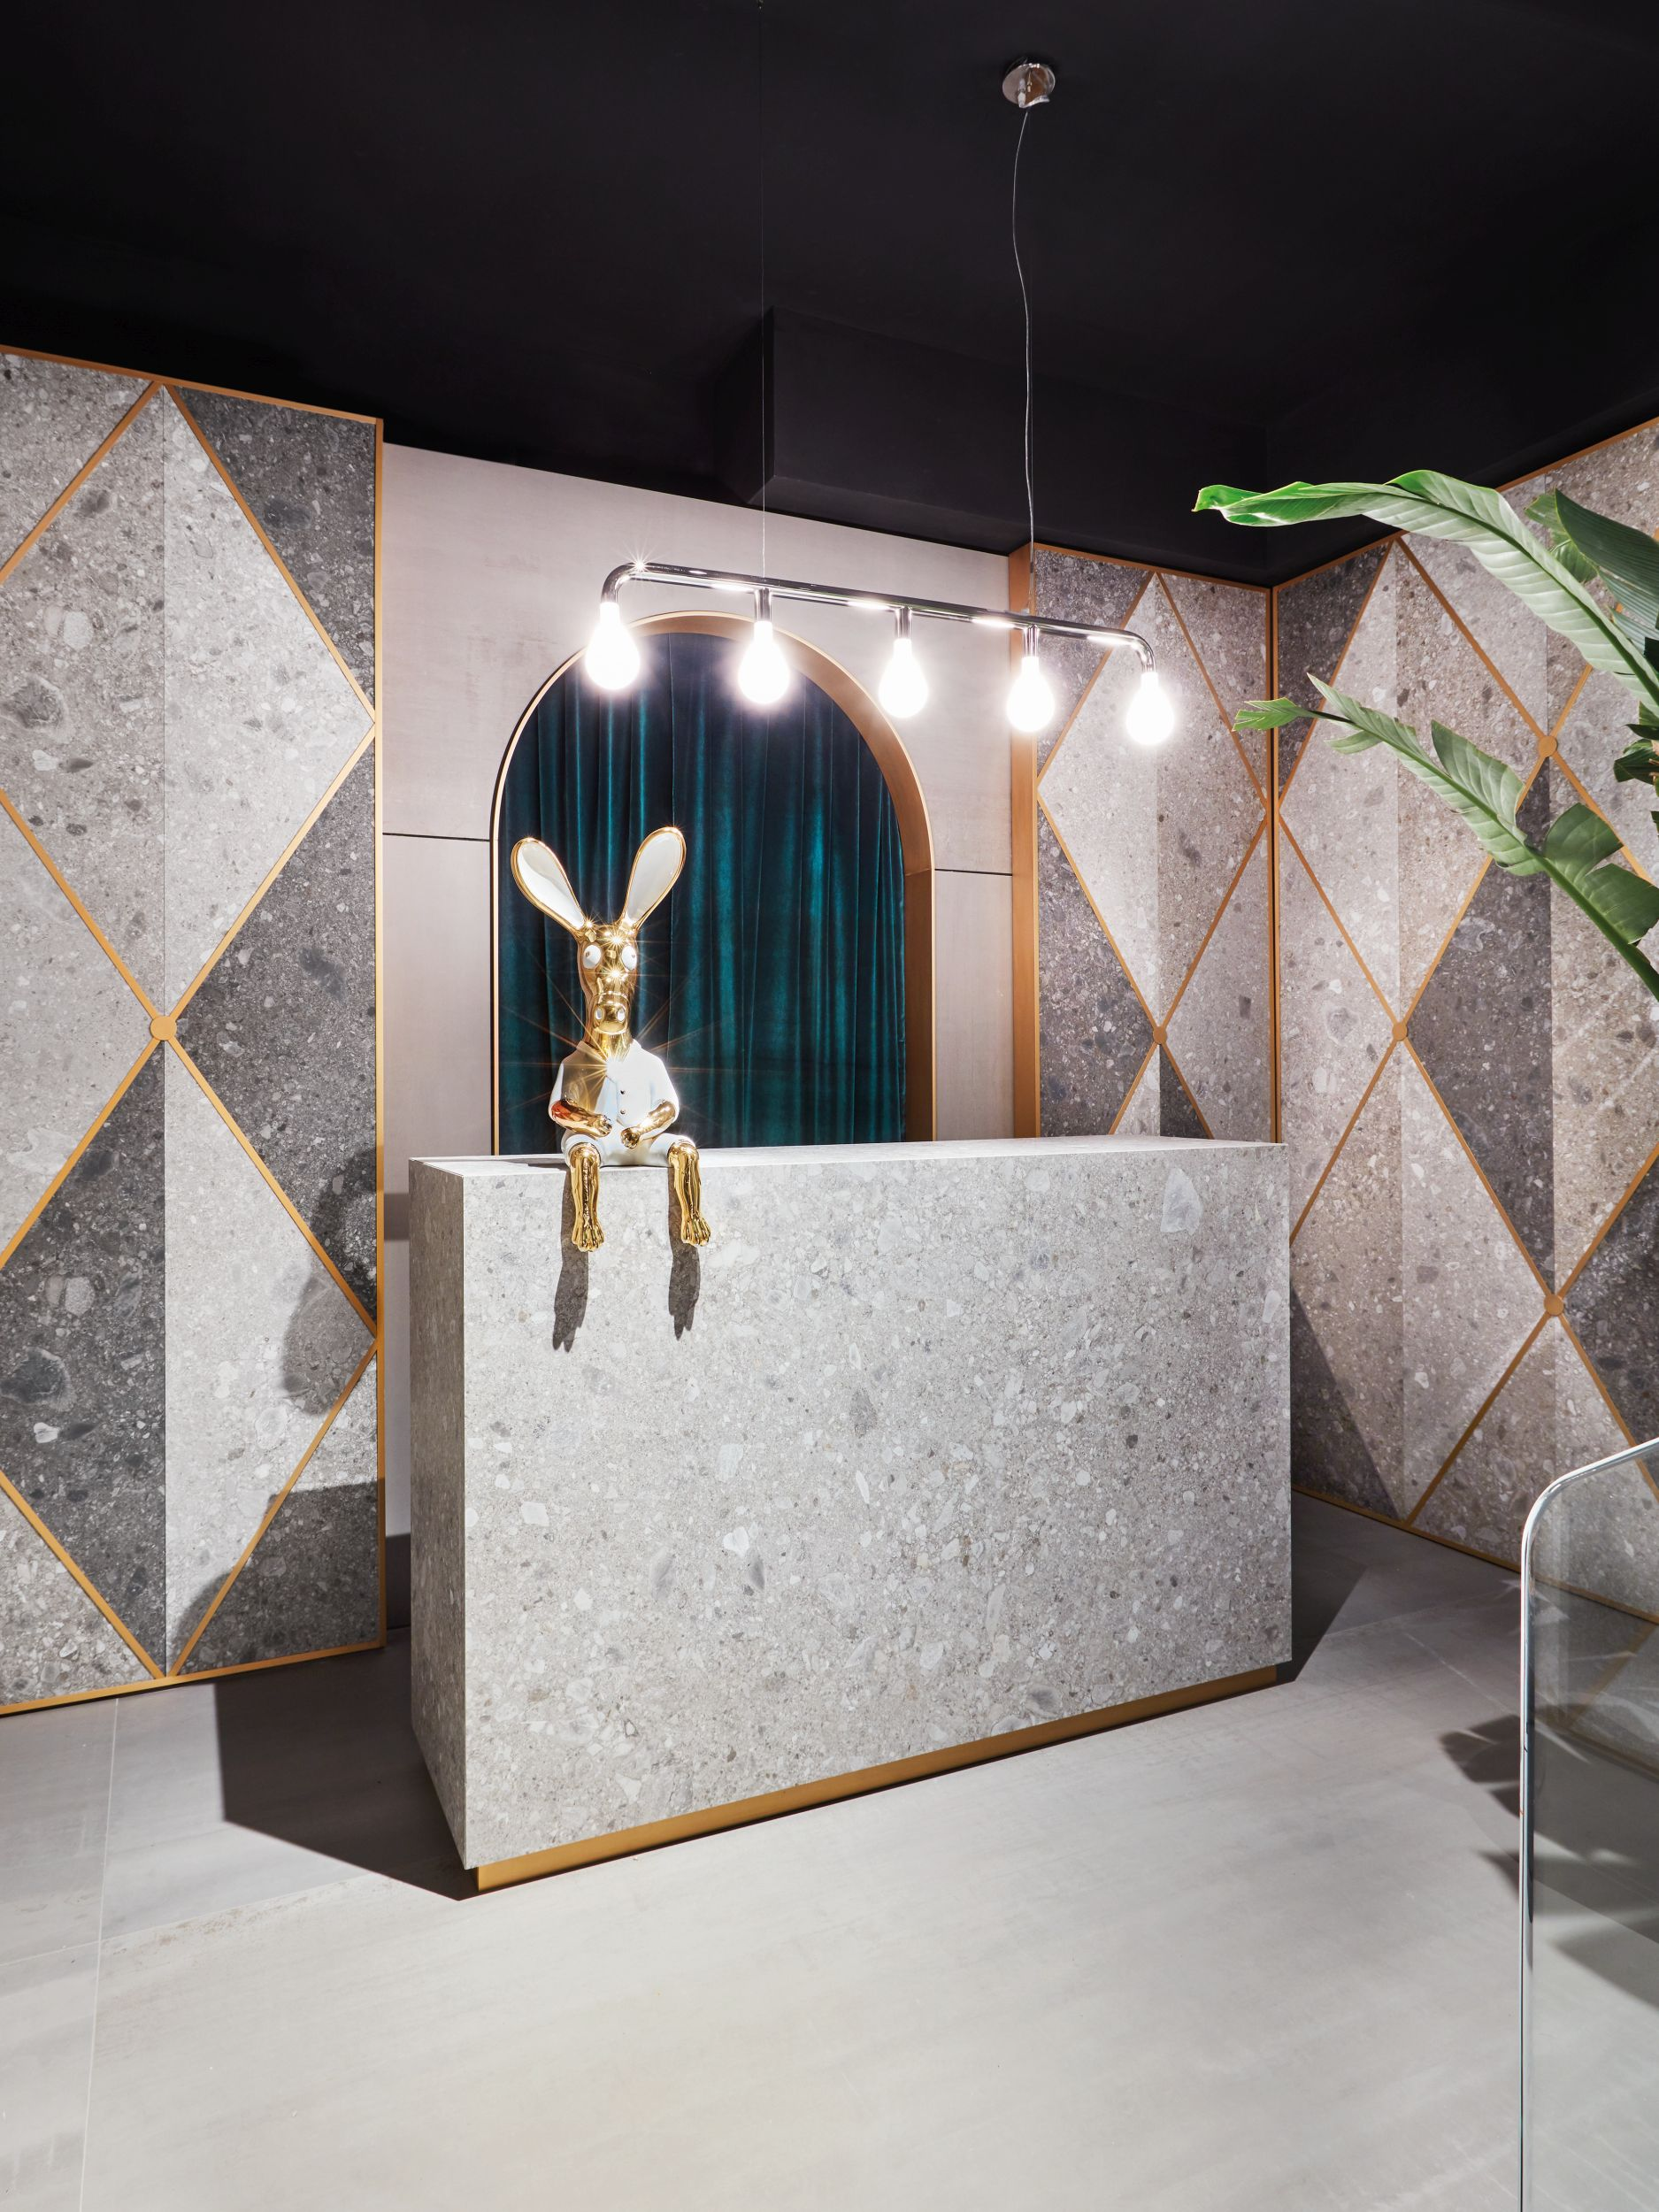 The tile club Marazzi